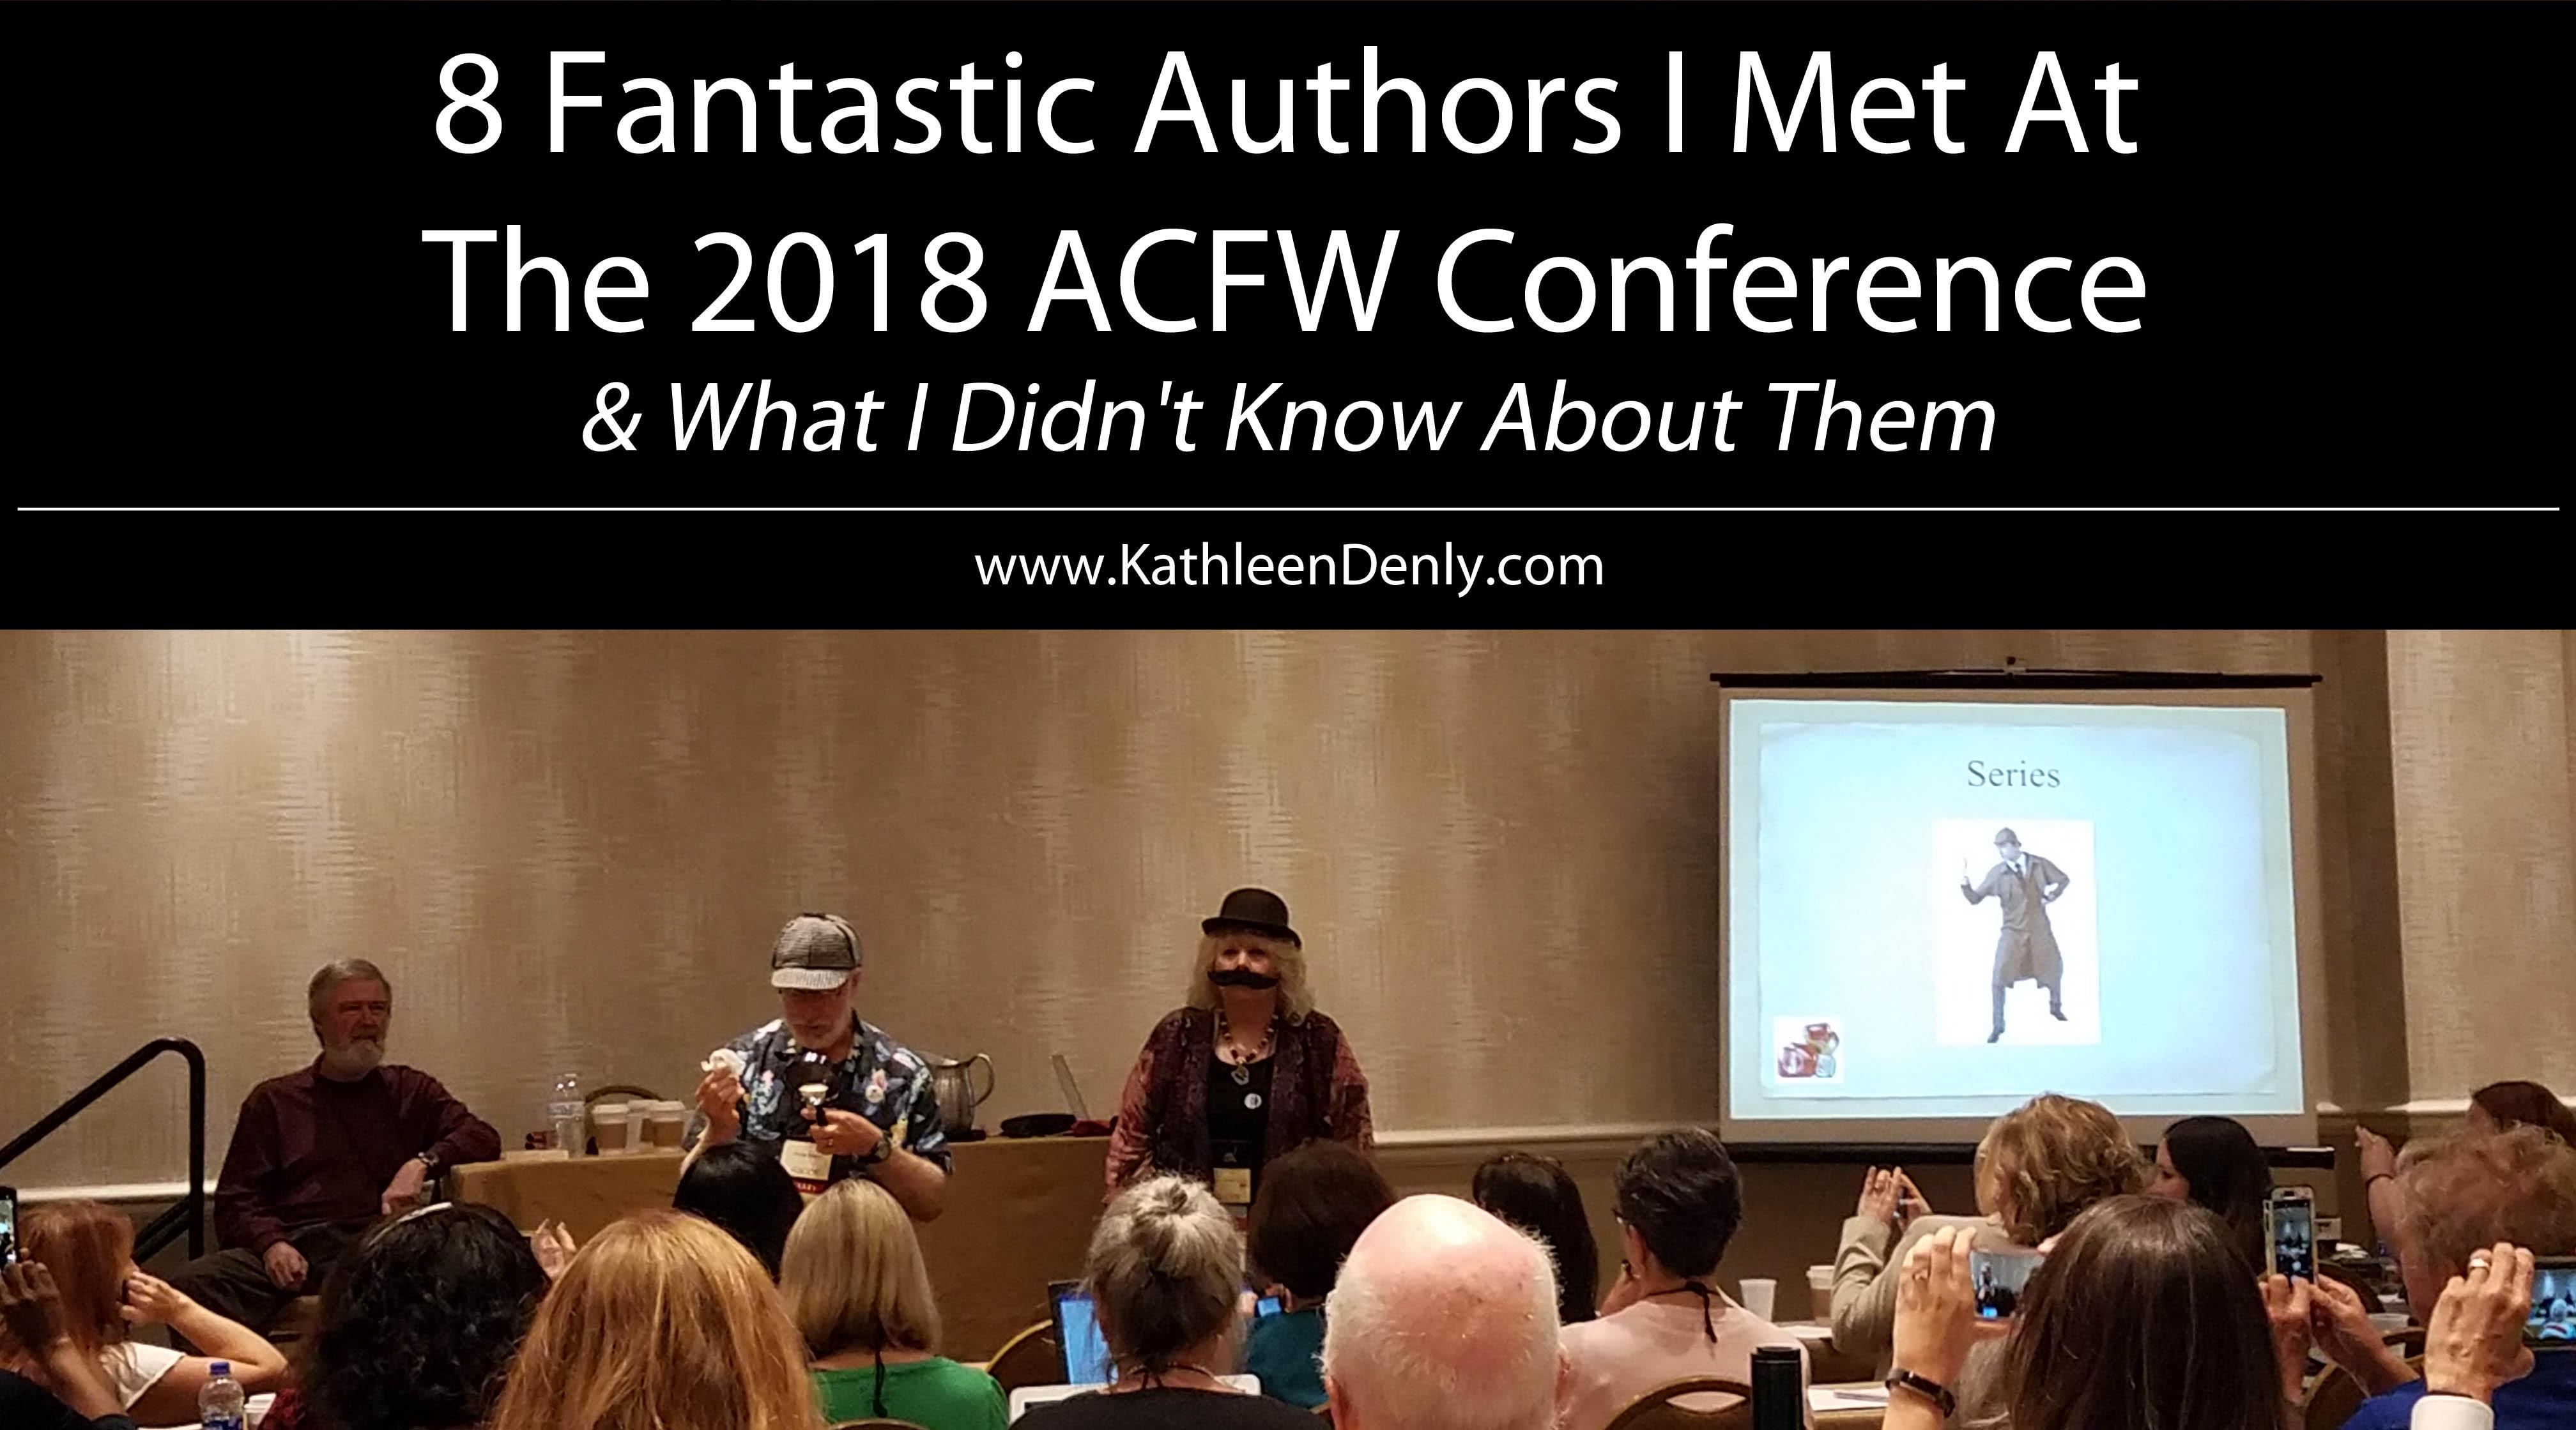 8 Fantastic Authors ACFW 2018